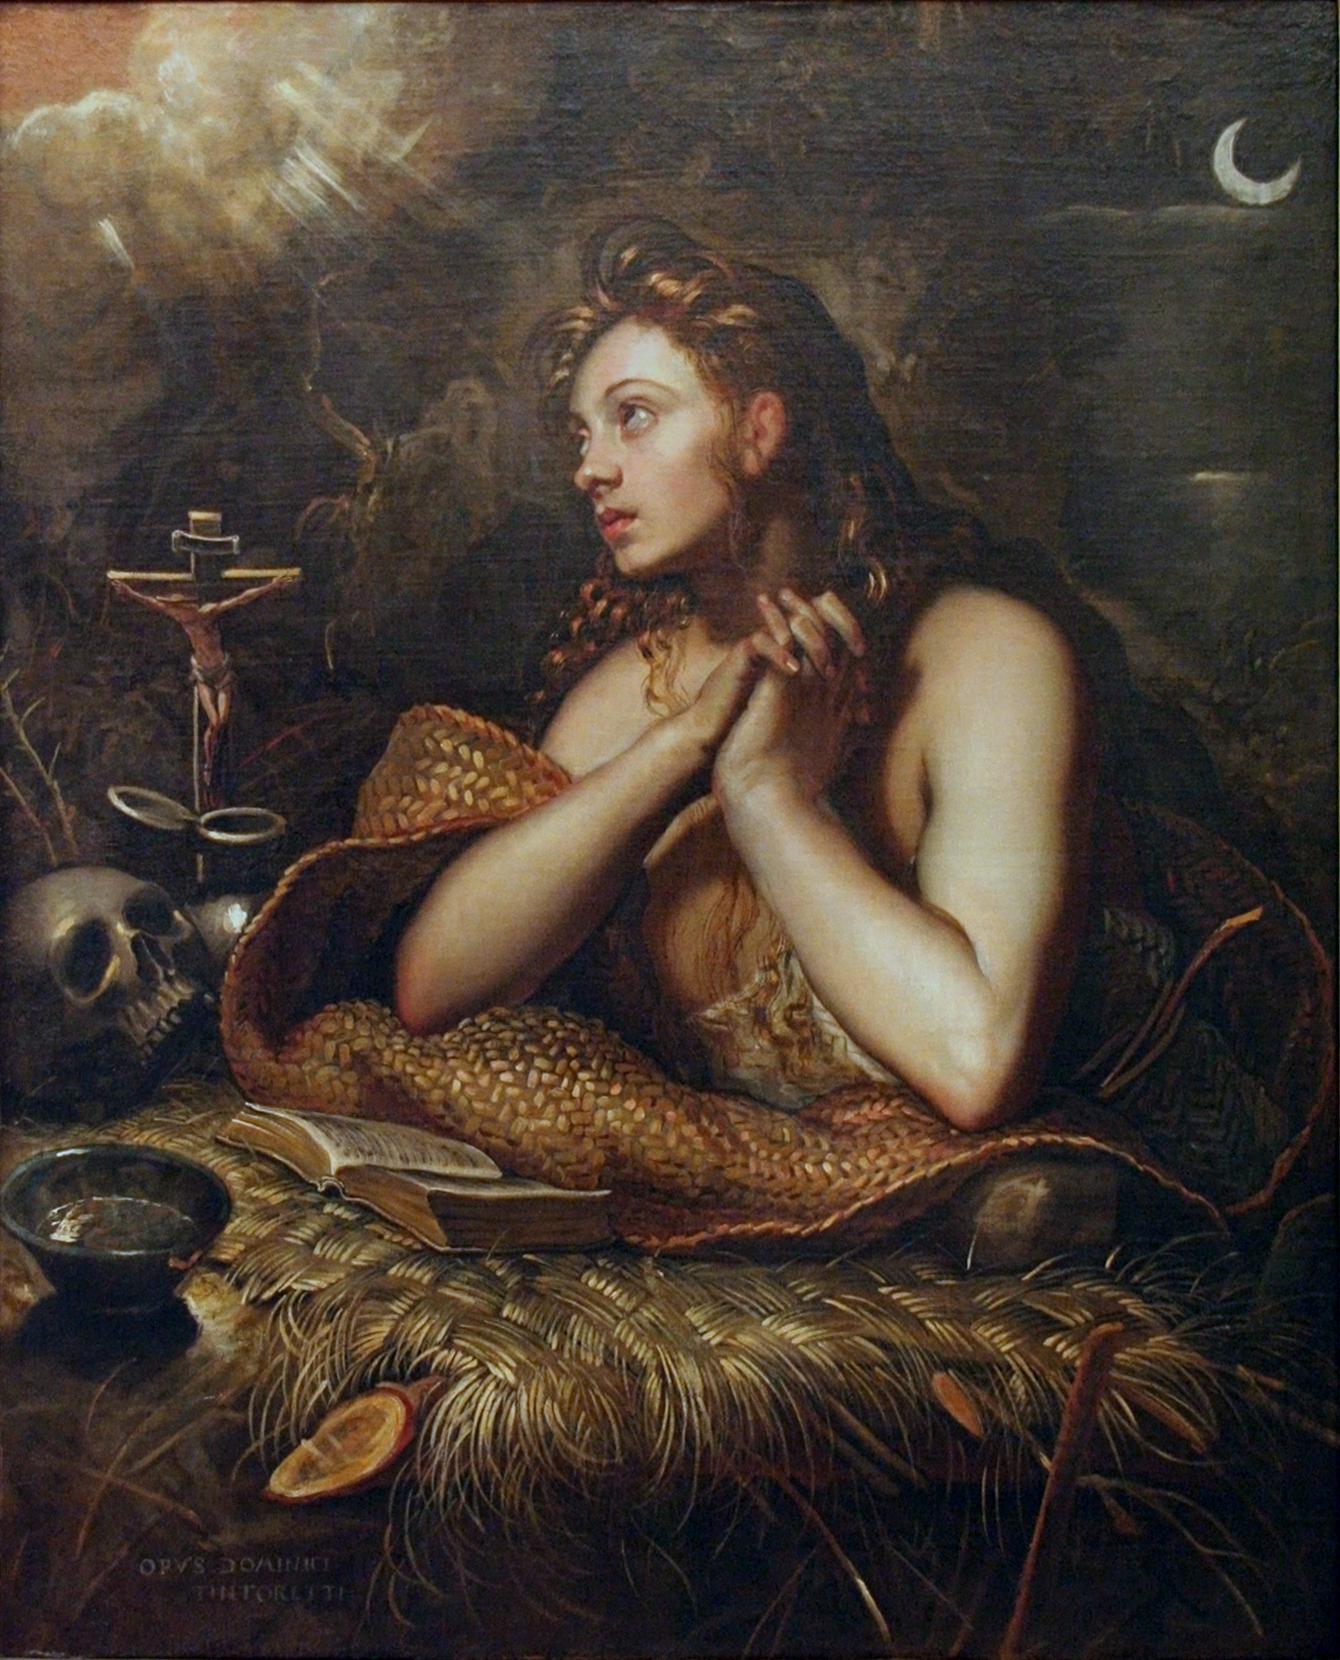 The Penitent Magdalene - a travesty of historical falsehood.